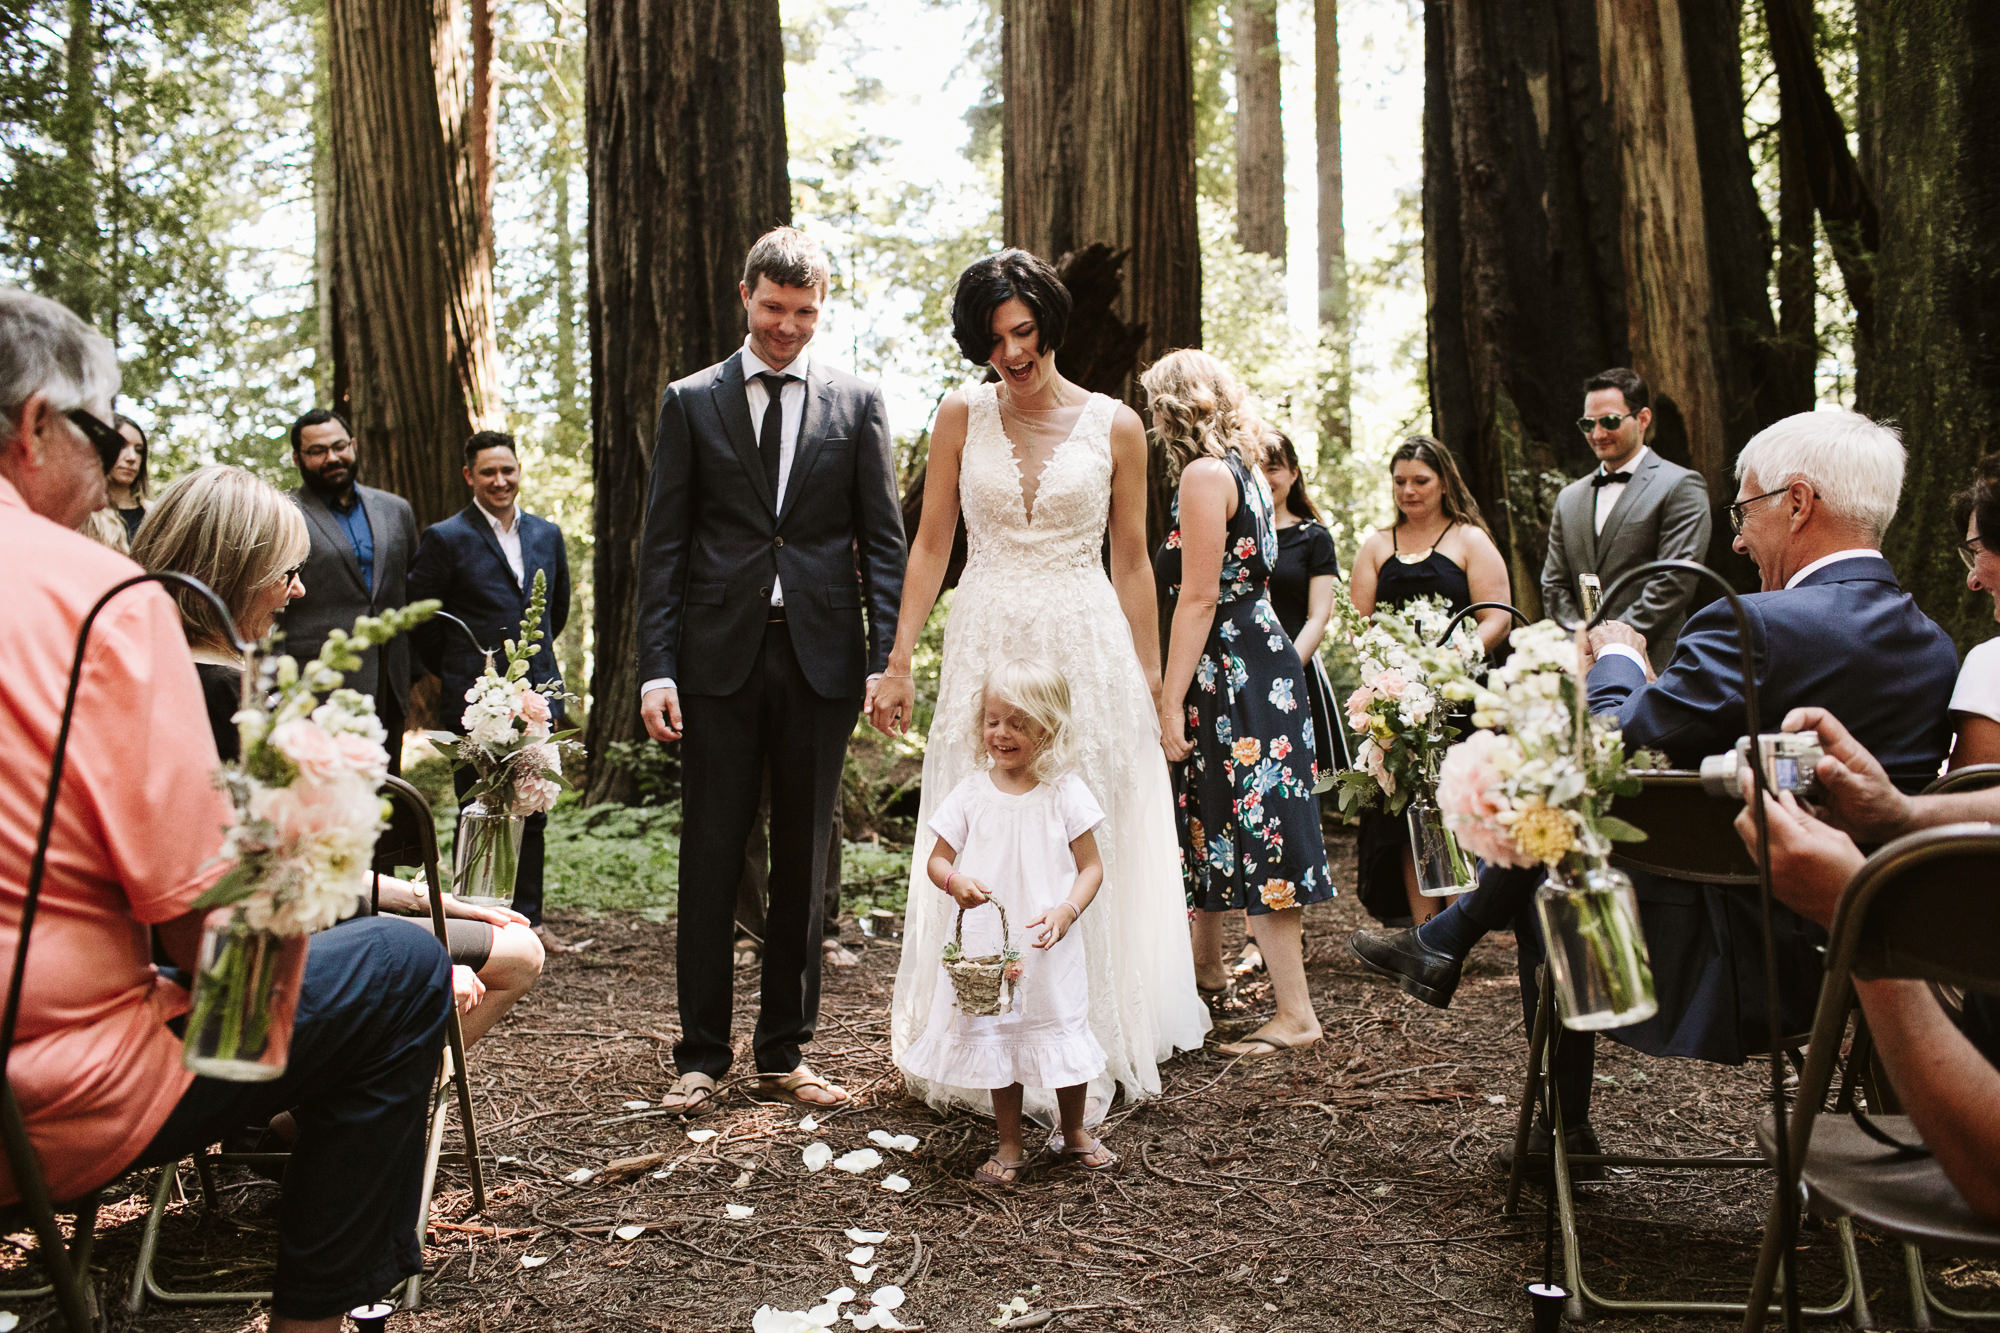 California-wedding-photographer-alfonso-flores-pamplin-groove-211.jpg